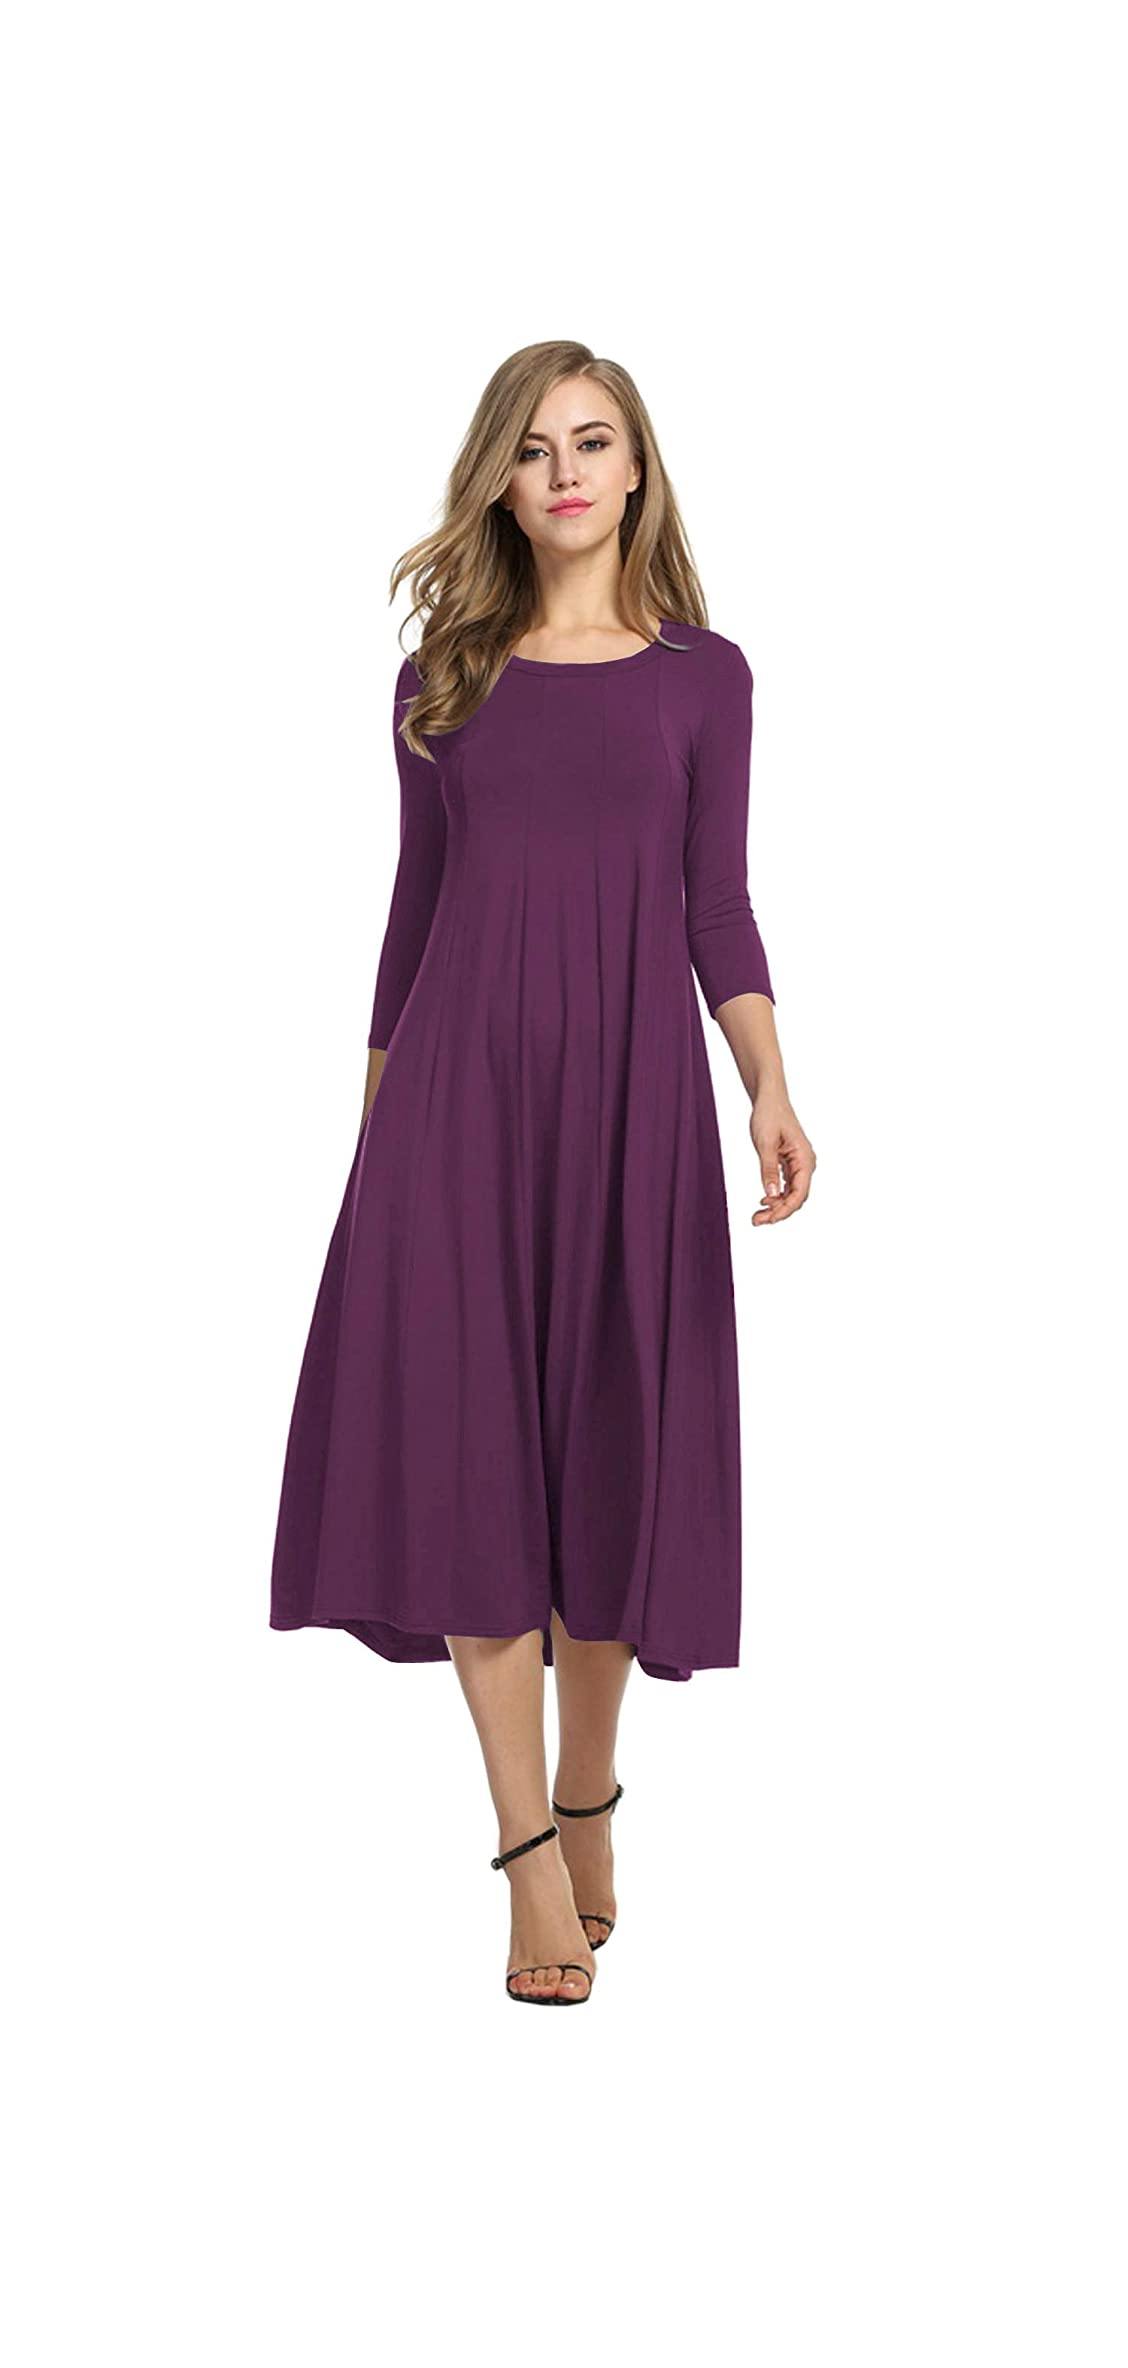 Women's / Sleeve A-line And Flare Midi Long Dress